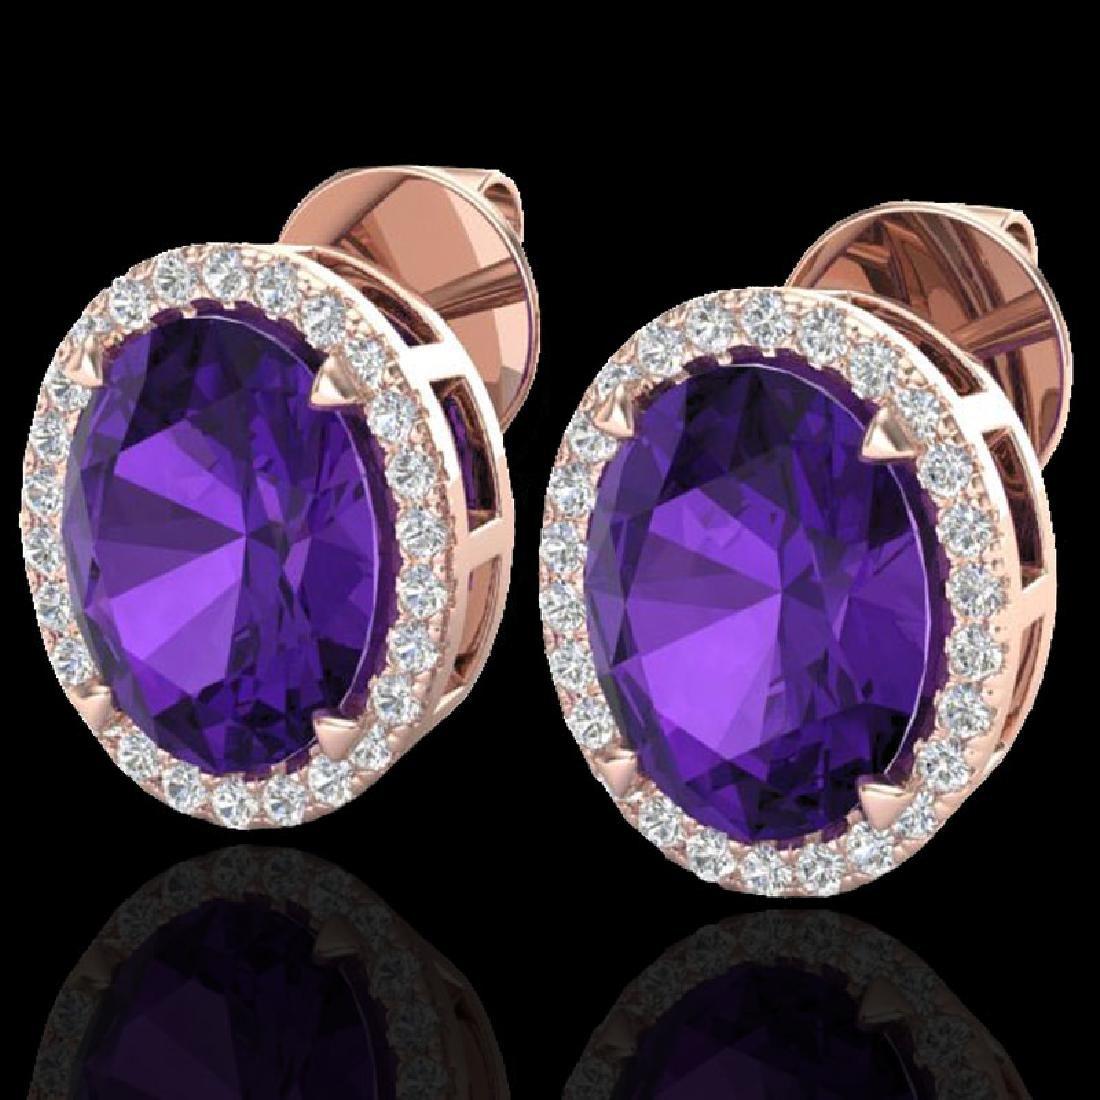 5.50 CTW Amethyst & Micro VS/SI Diamond Halo Earrings